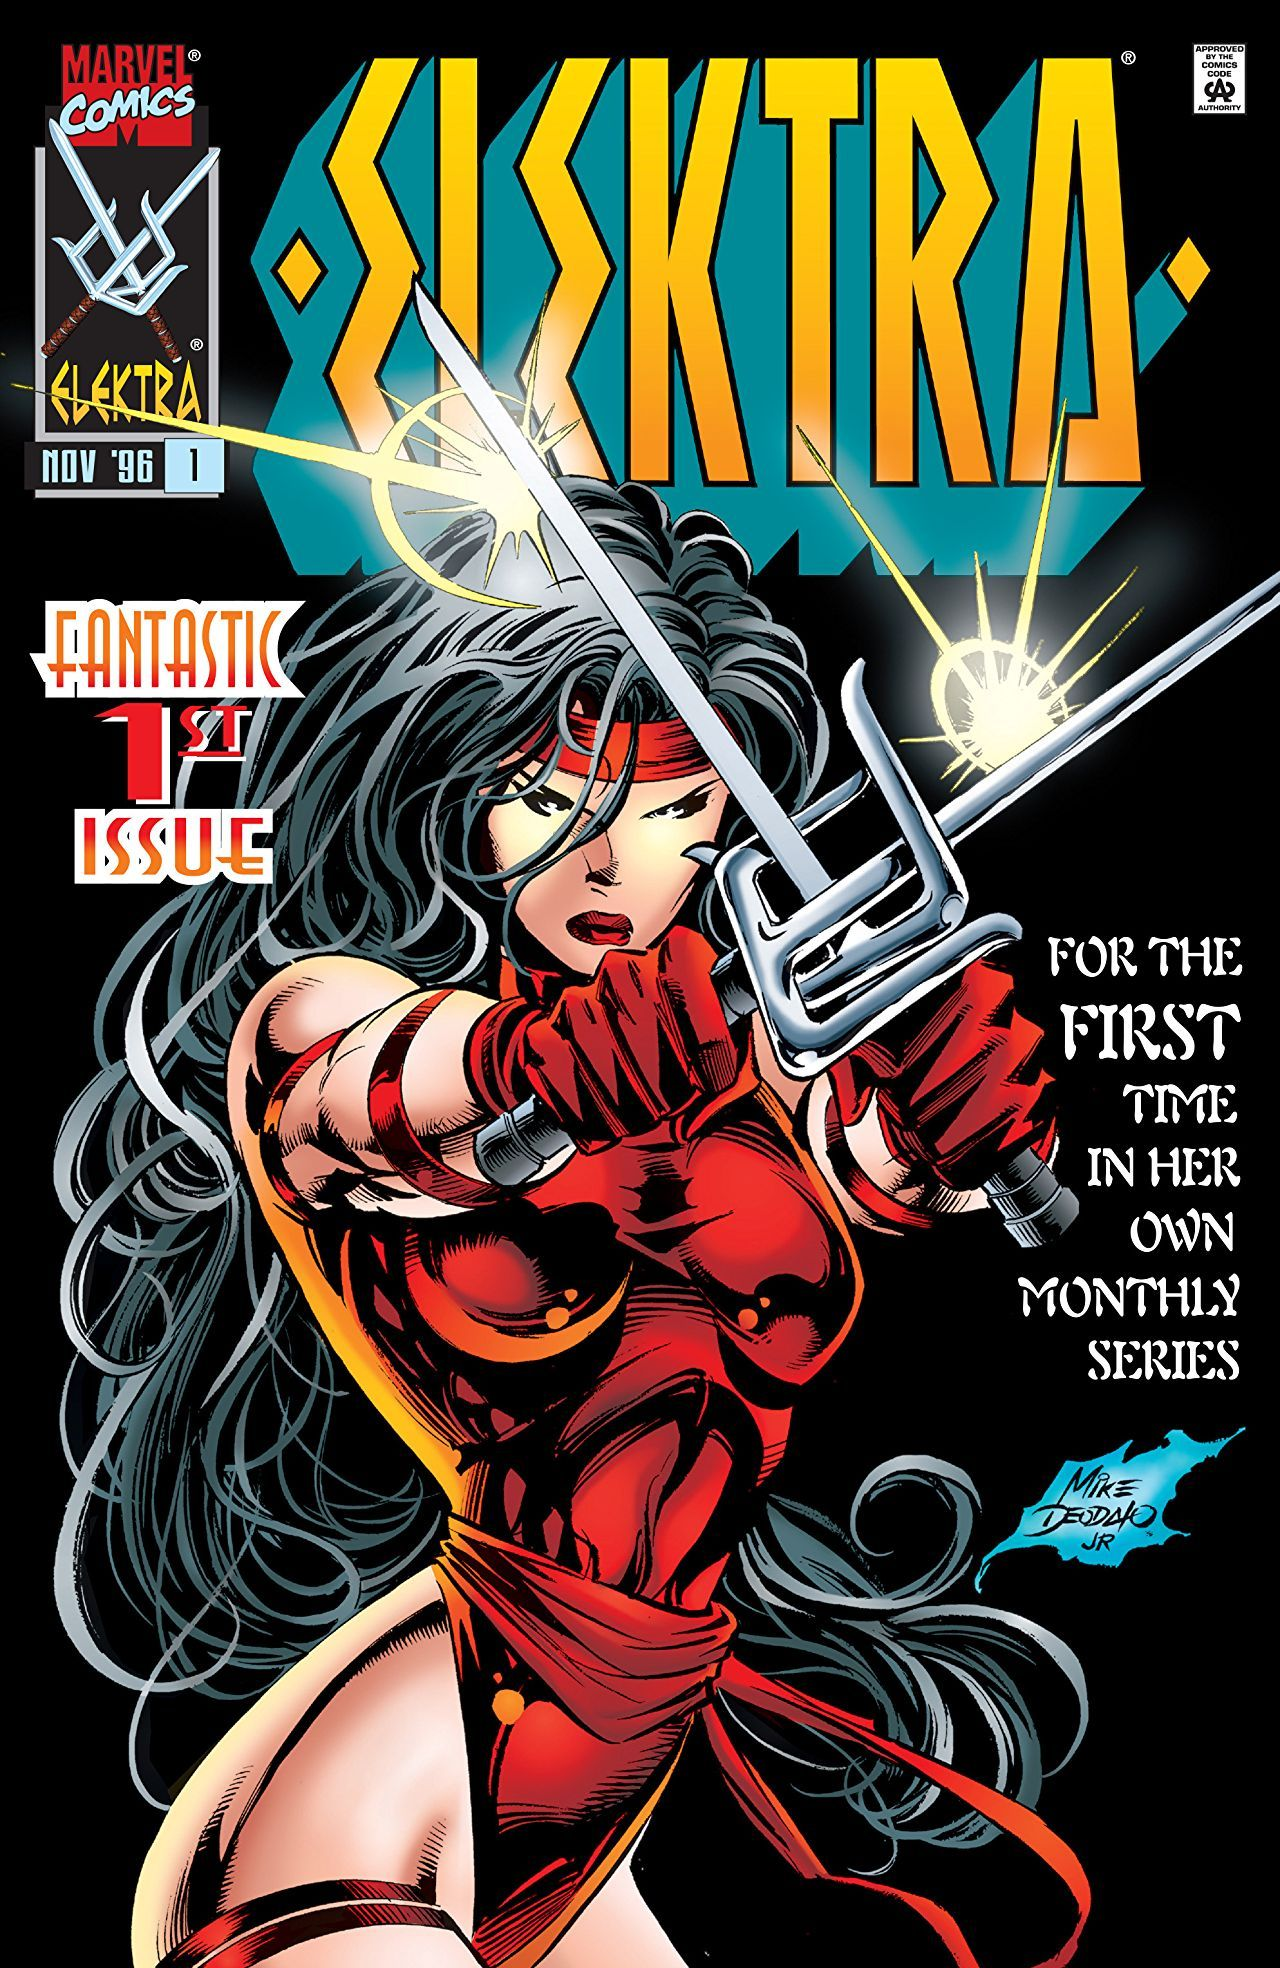 Elektra 1 Afraid Of The Dark November 1996 Comics Mike Deodato Marvel Comics